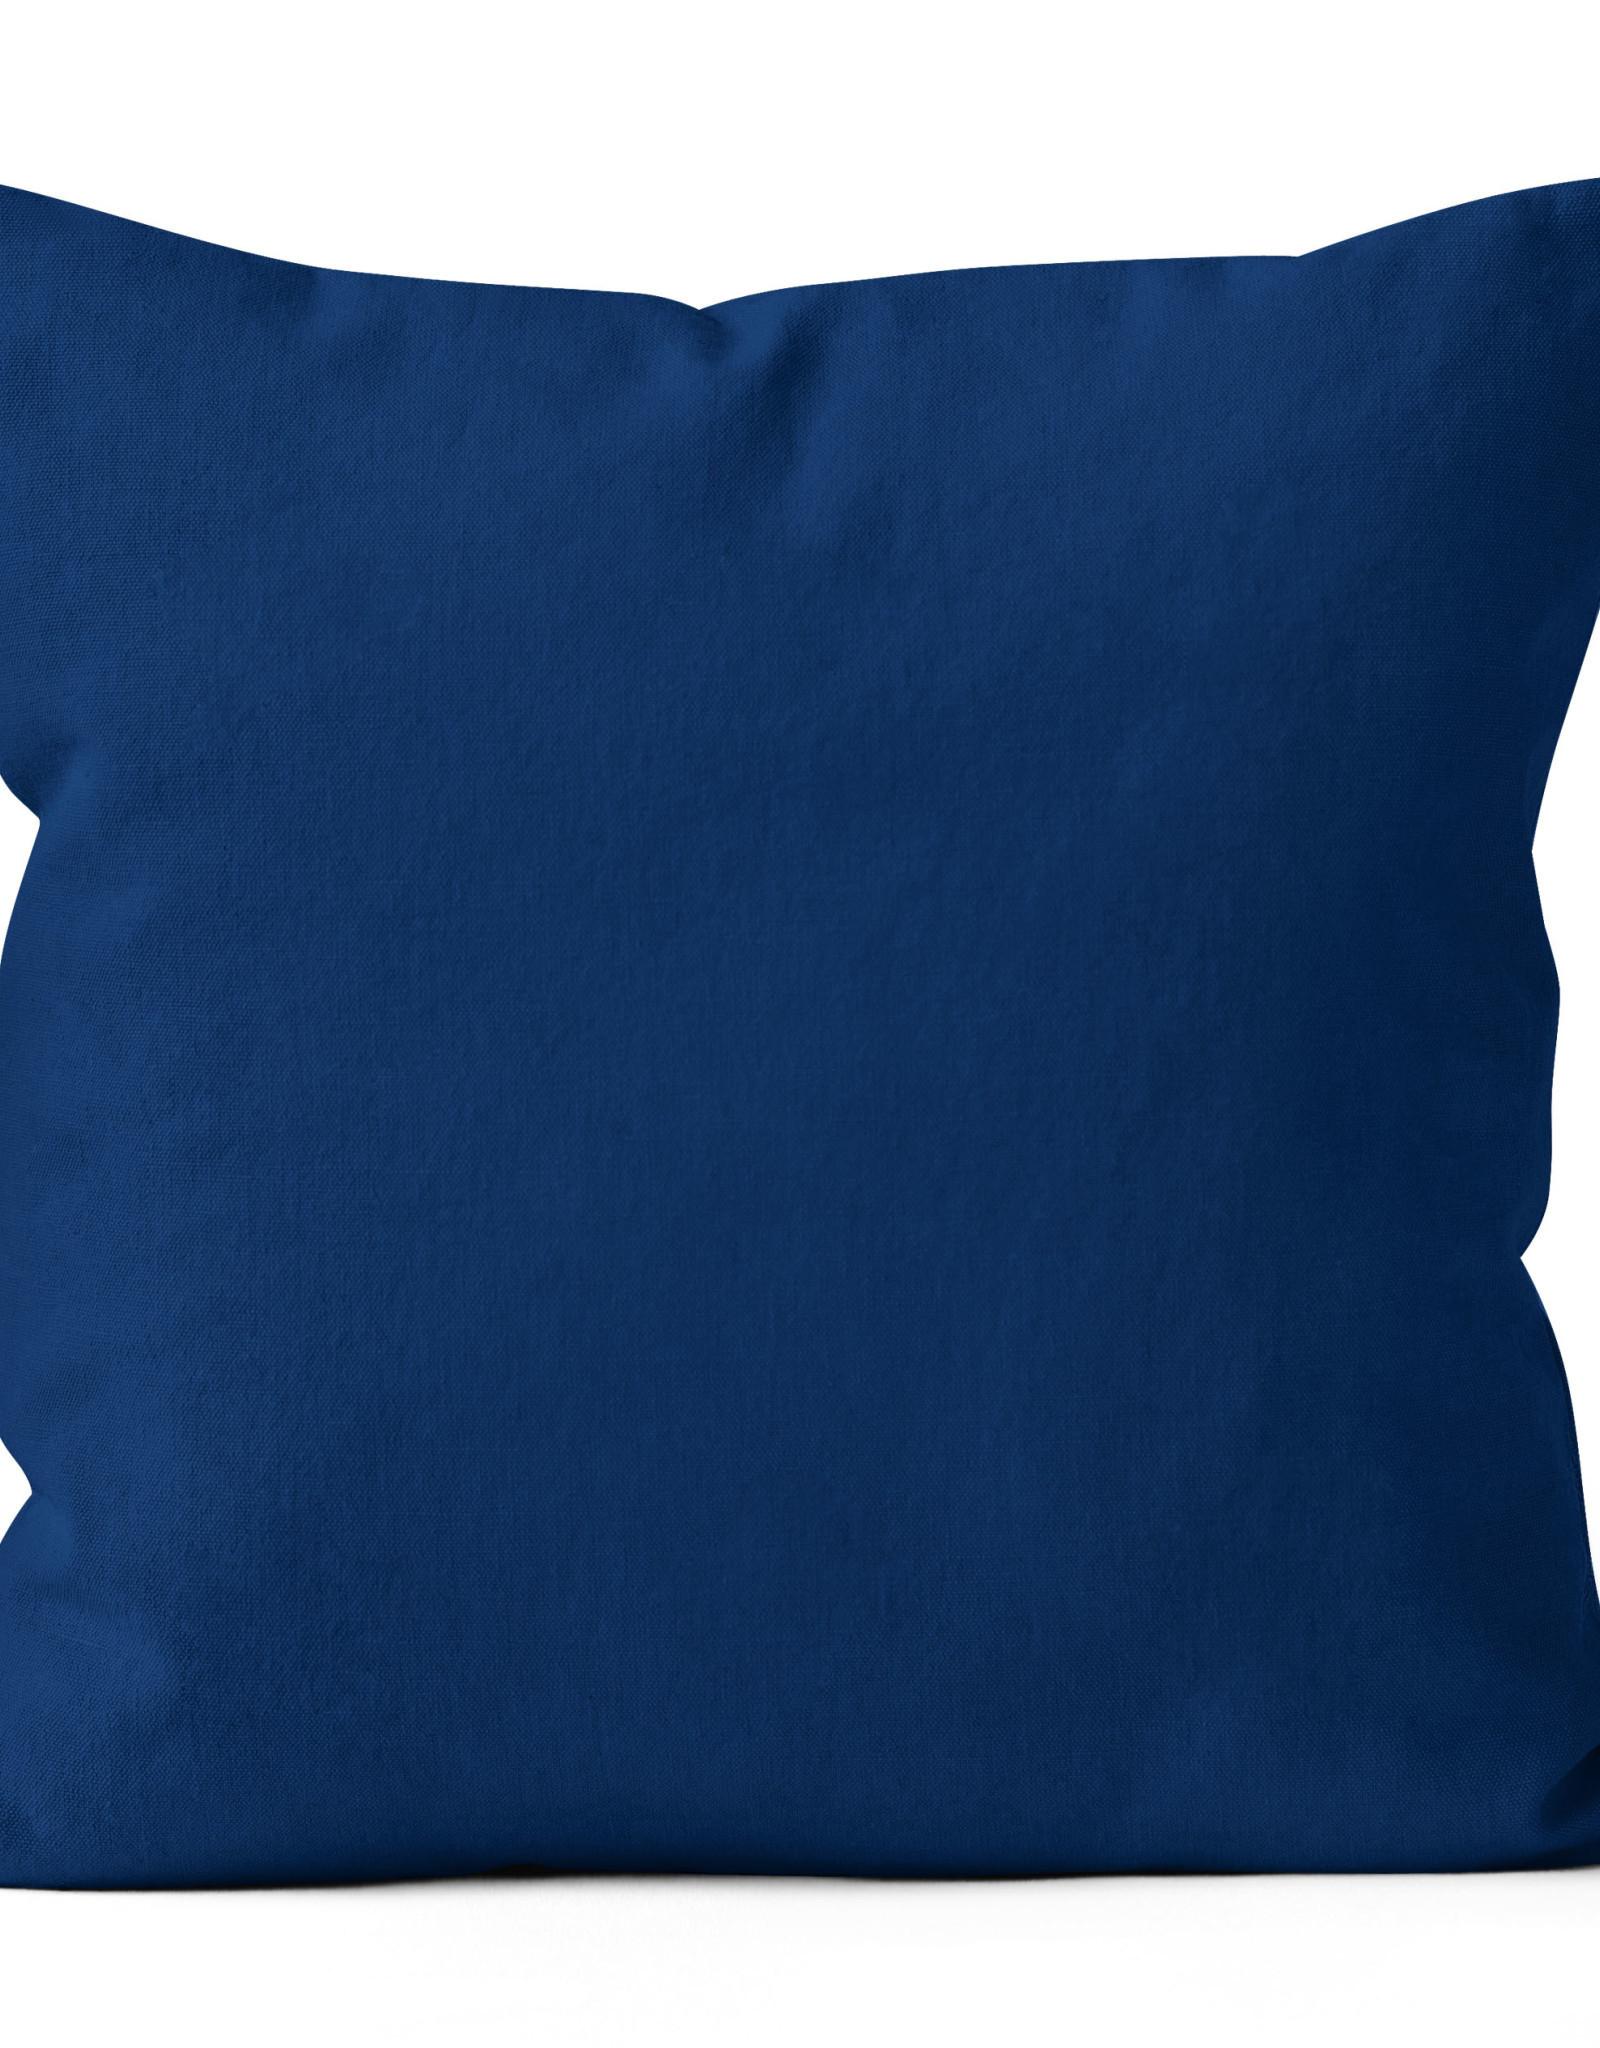 "Jardine 18""x18"" Indoor Sublimated Pillow Wingate Over University Cursive"